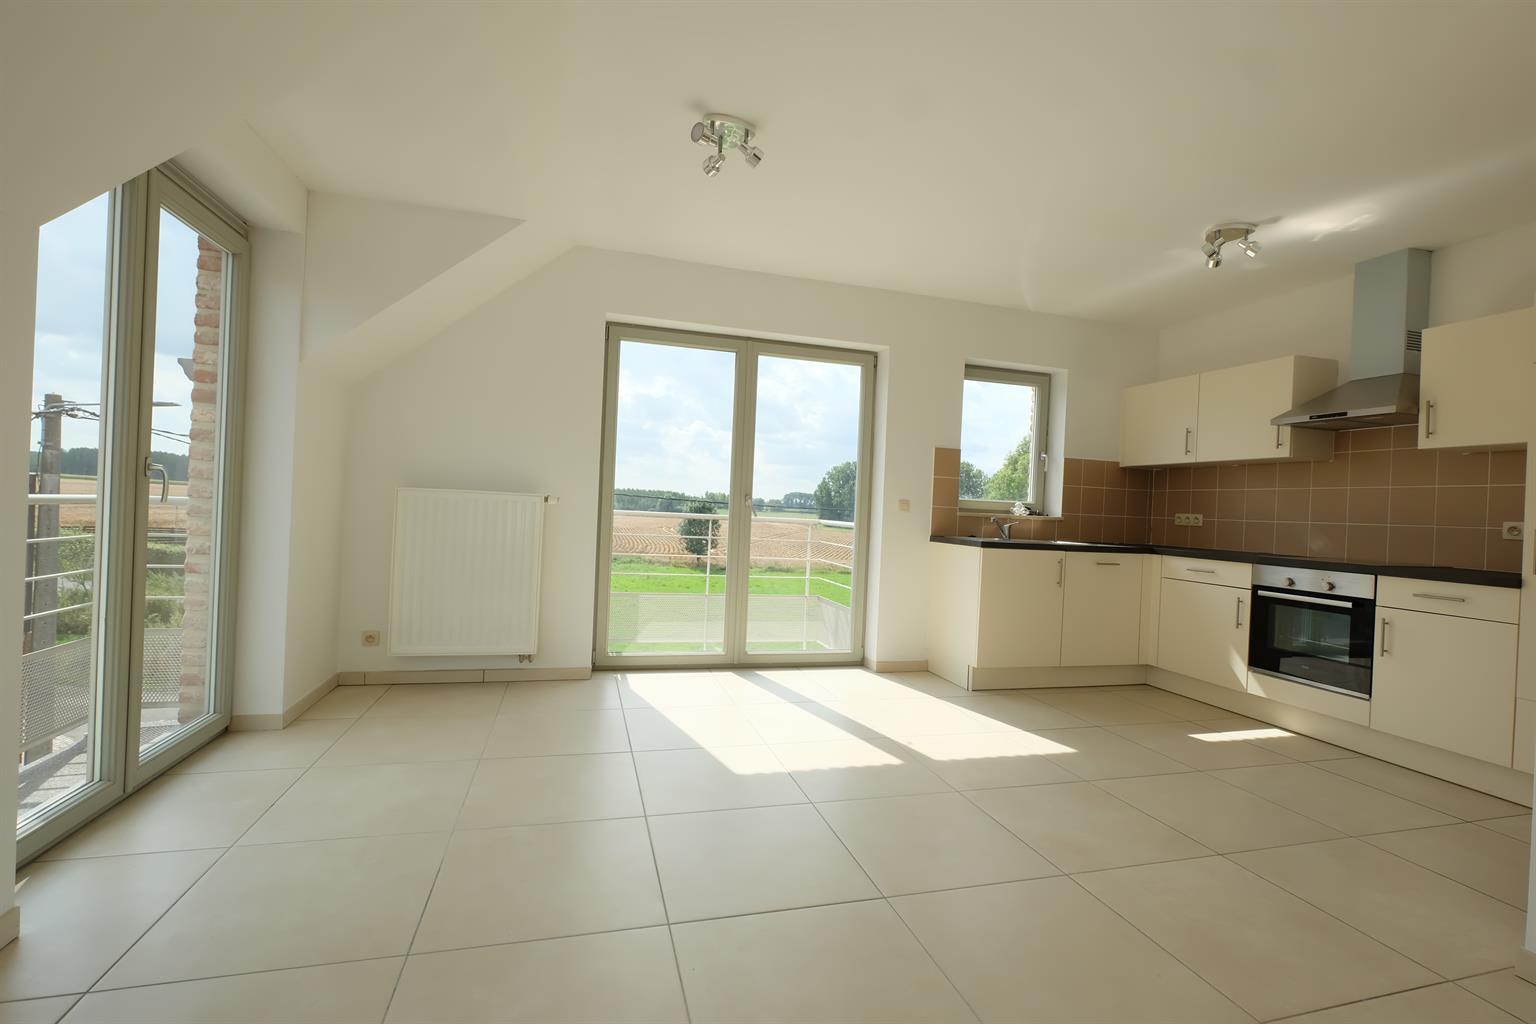 Appartement - Soignies - #4223150-2